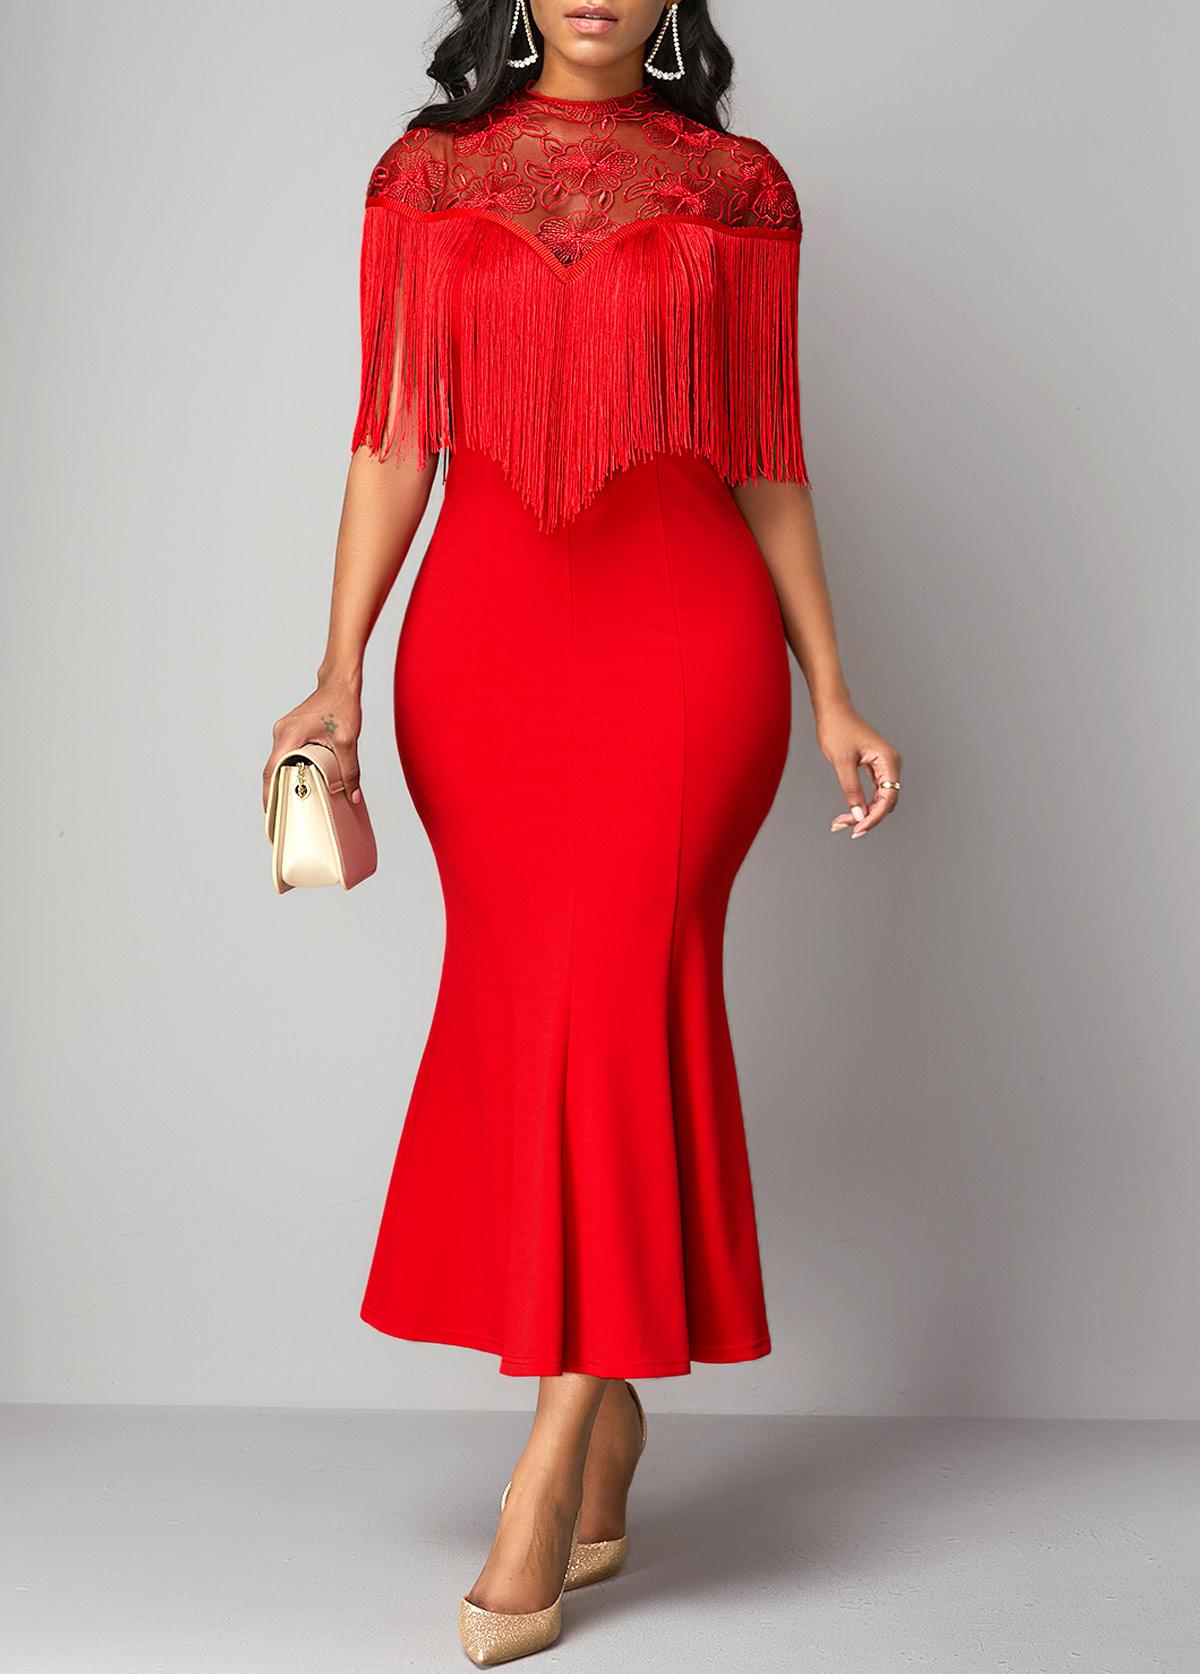 Ruffle Hem Tassel Embellished Lace Patchwork Dress